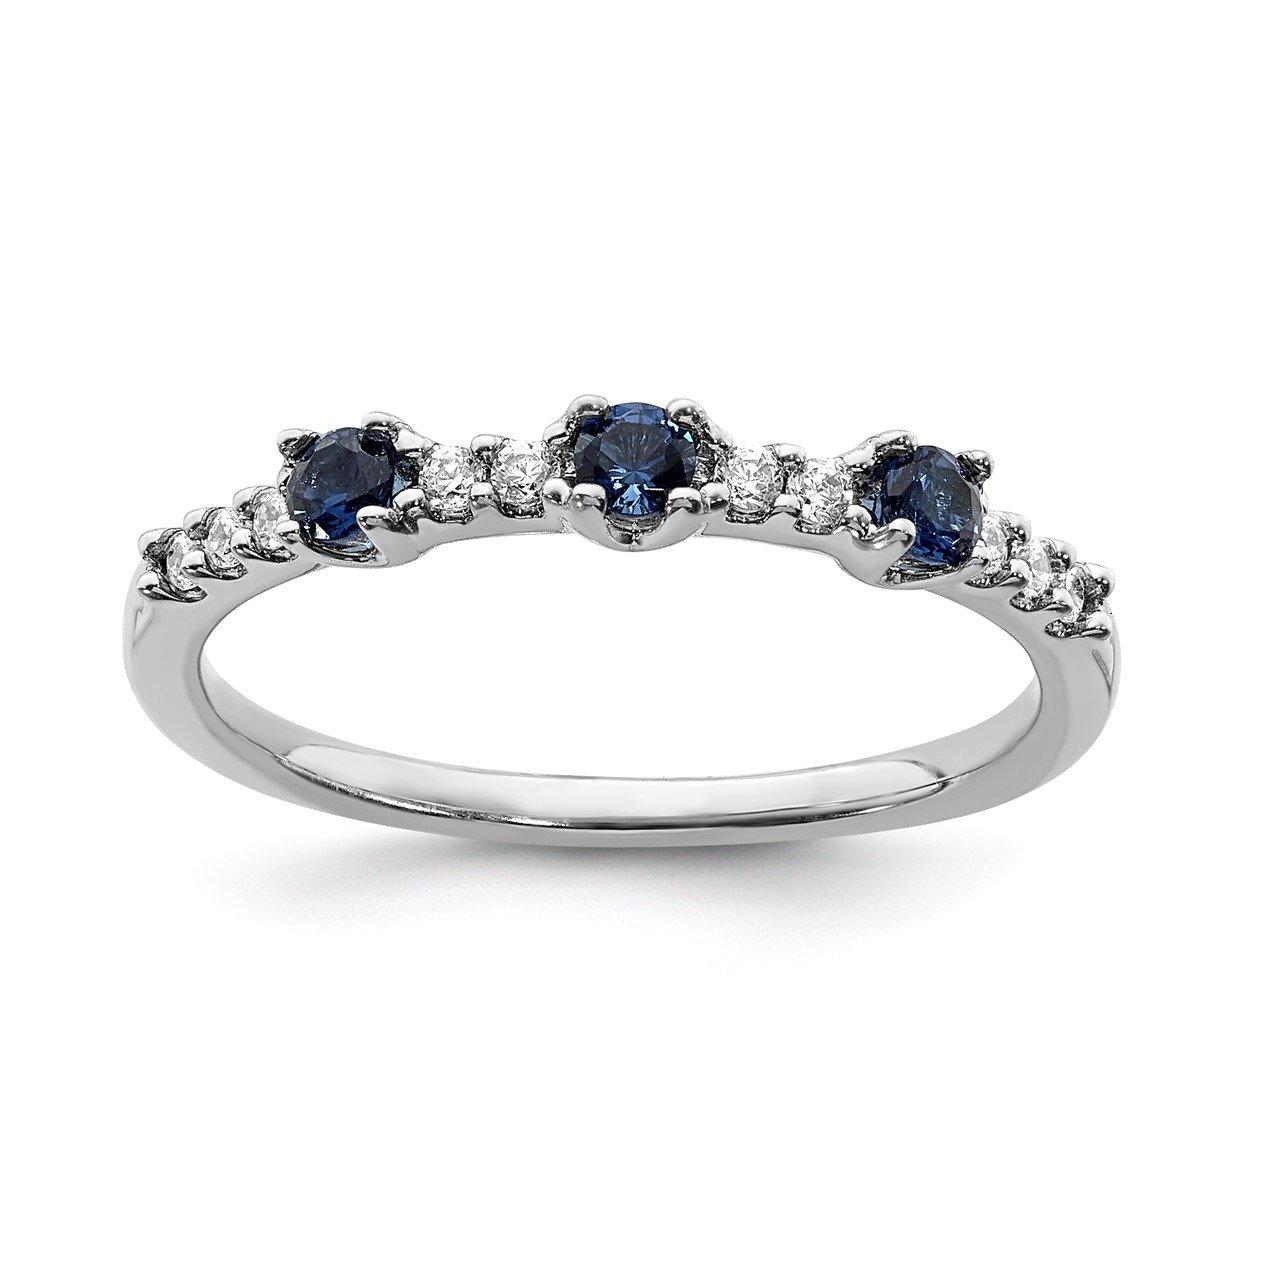 14k White Gold Diamond and Sapphire 3-Stone Ring